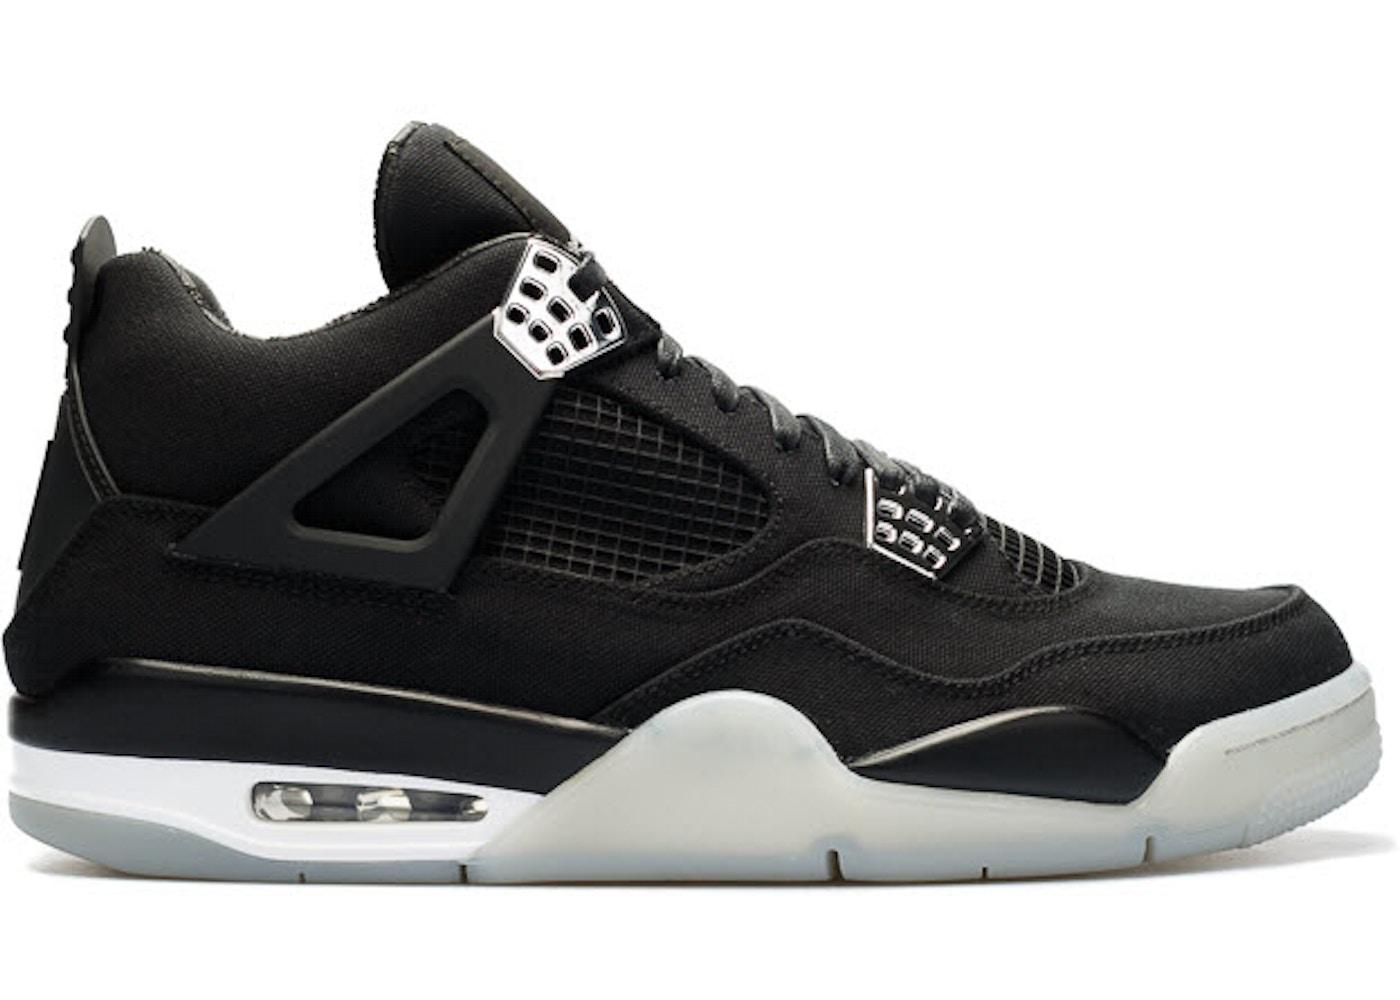 sale retailer a3fad f09ef Jordan 4 Retro Eminem Carhartt - 136863